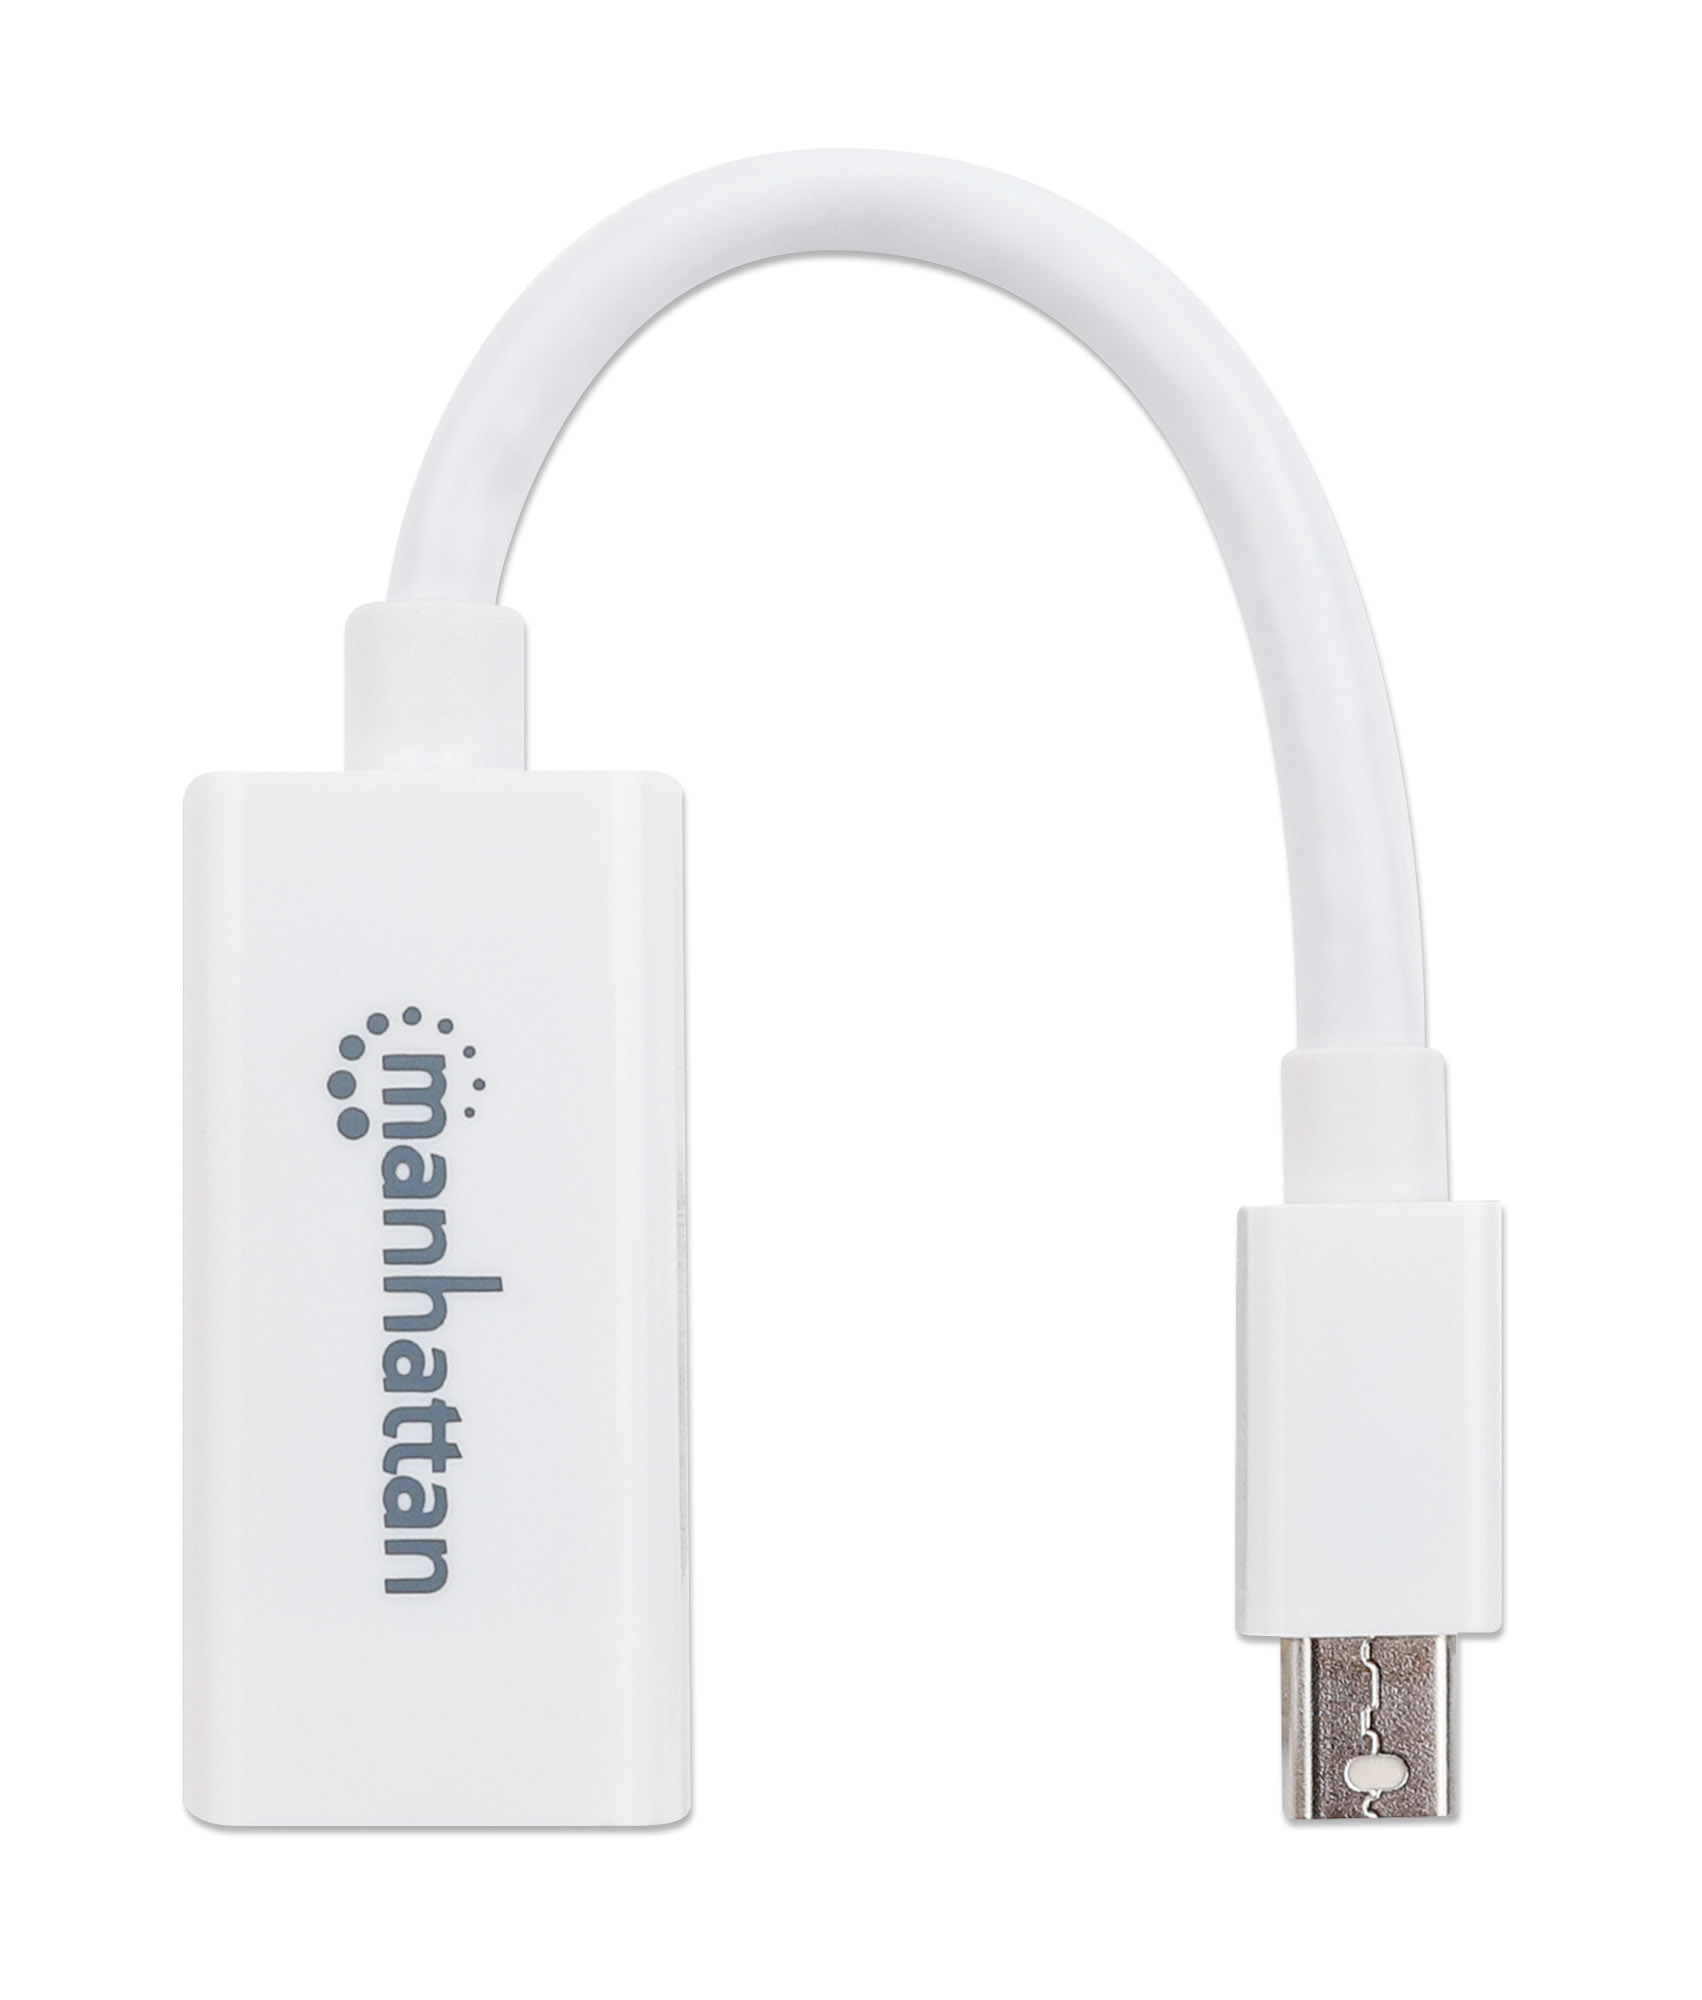 Passive Mini DisplayPort to HDMI Adapter